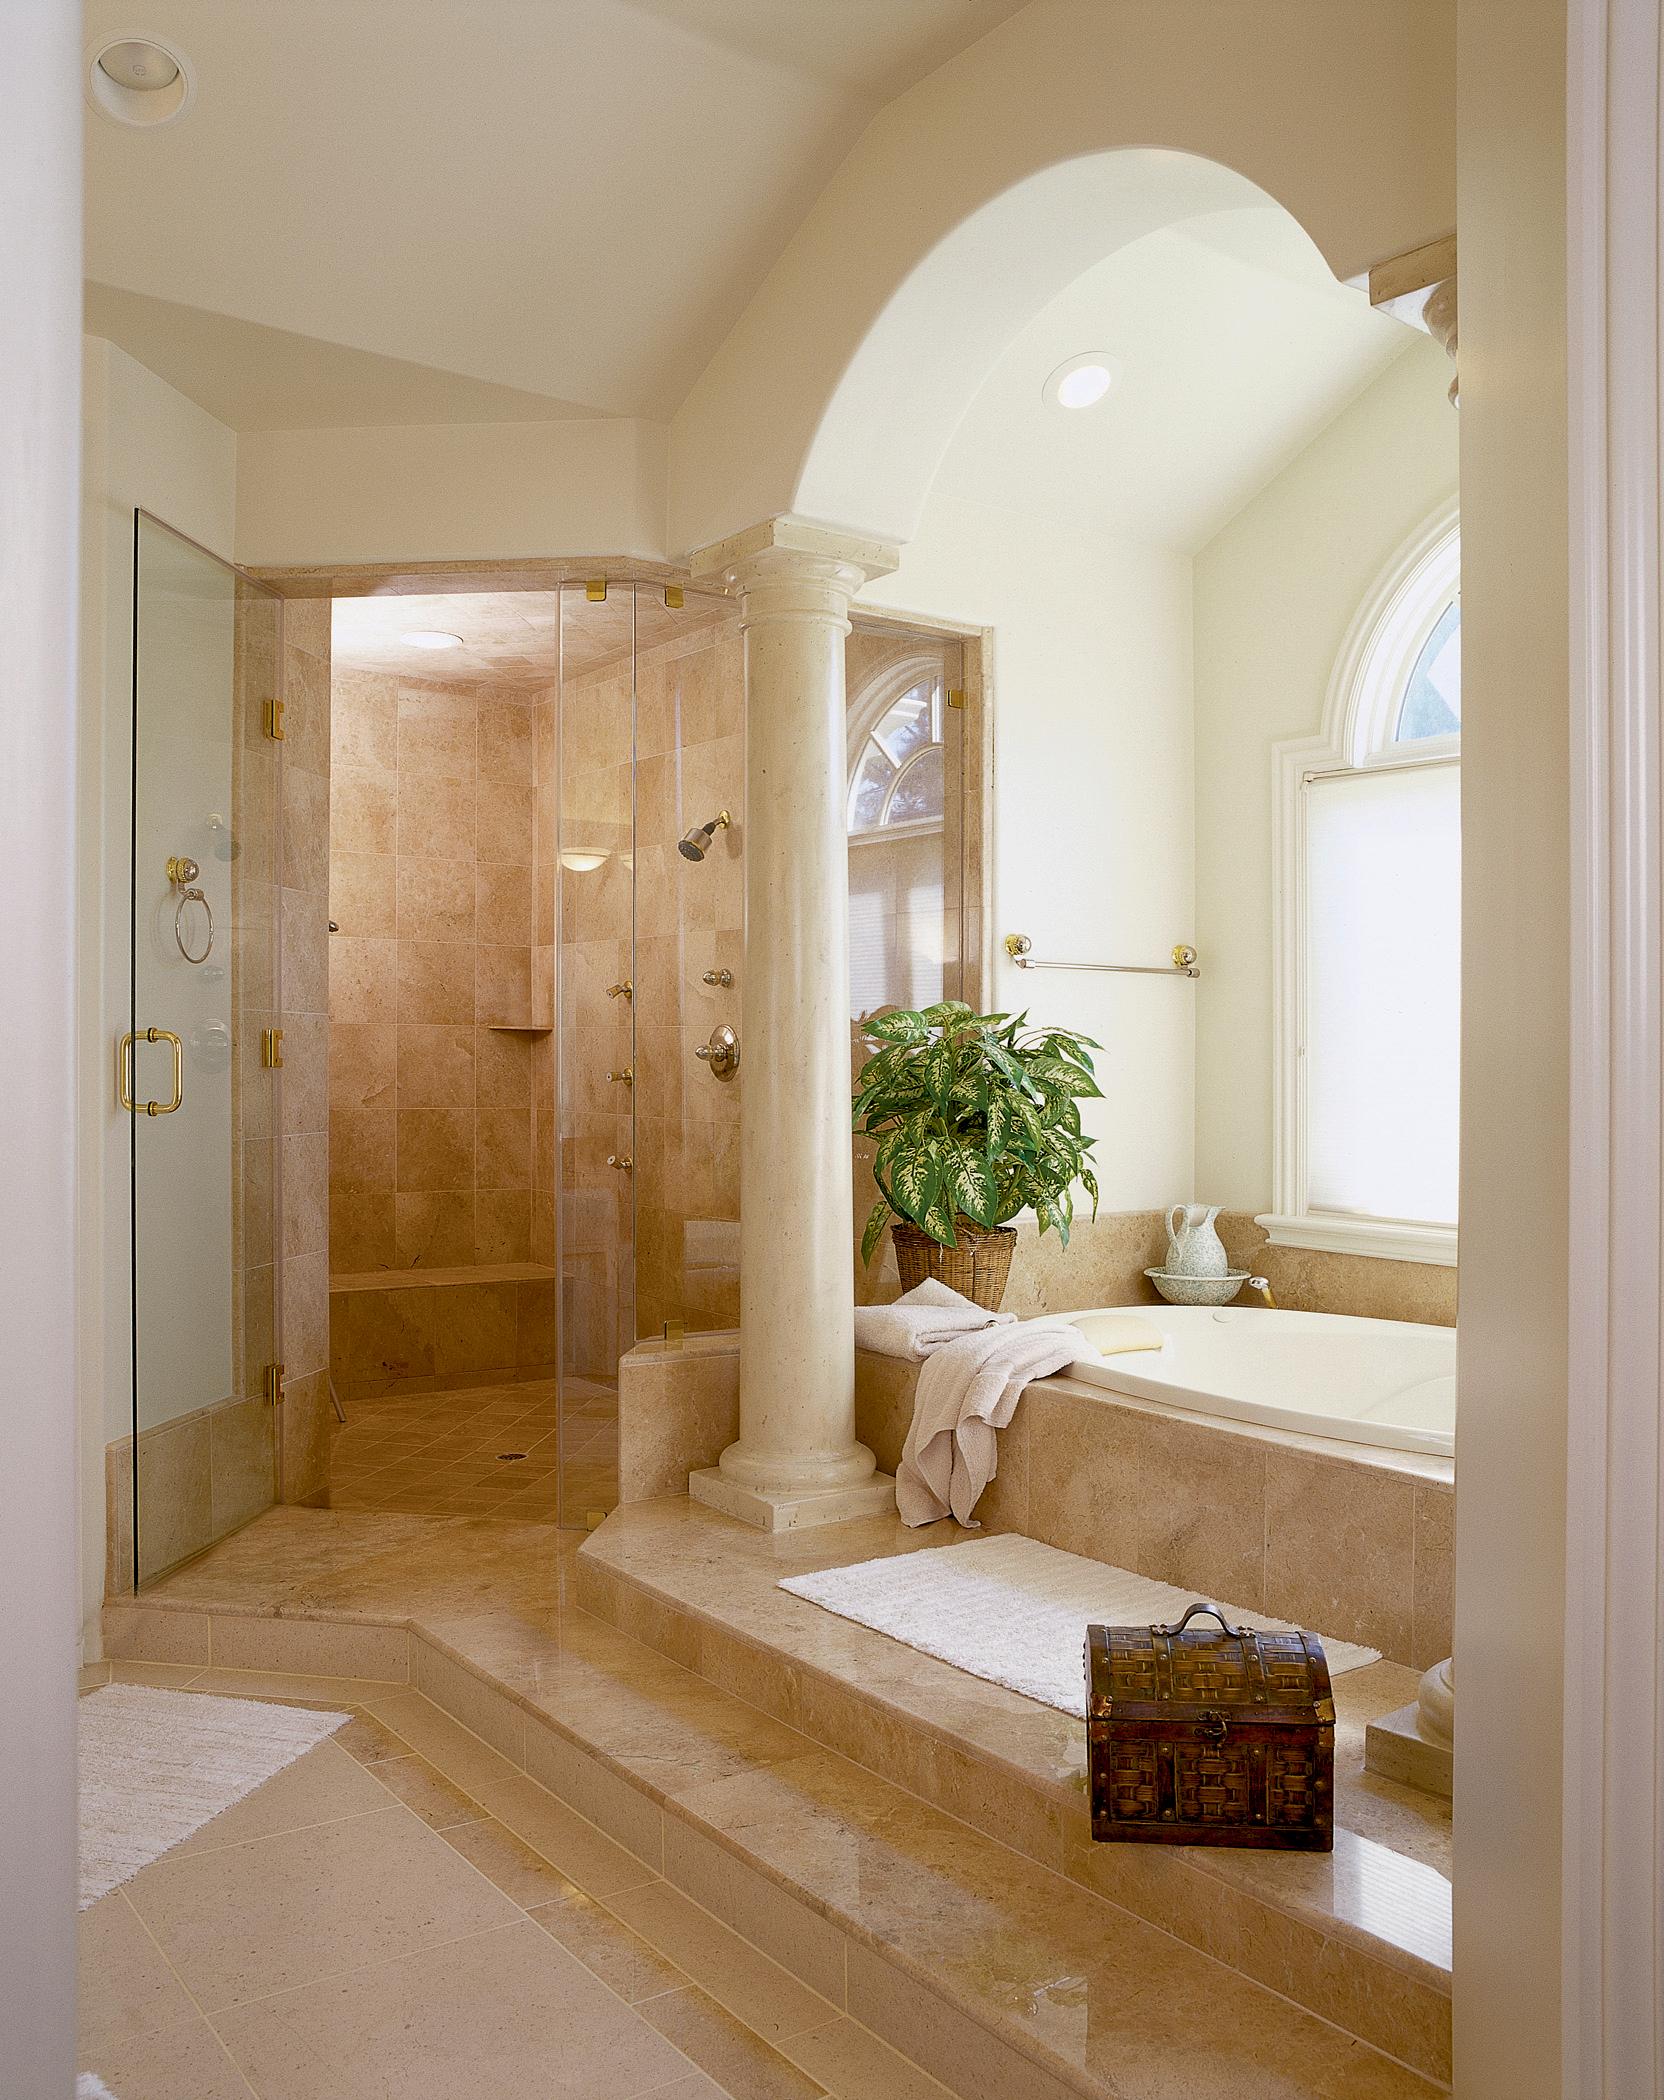 Luxury master bath featuring custom tile & marble